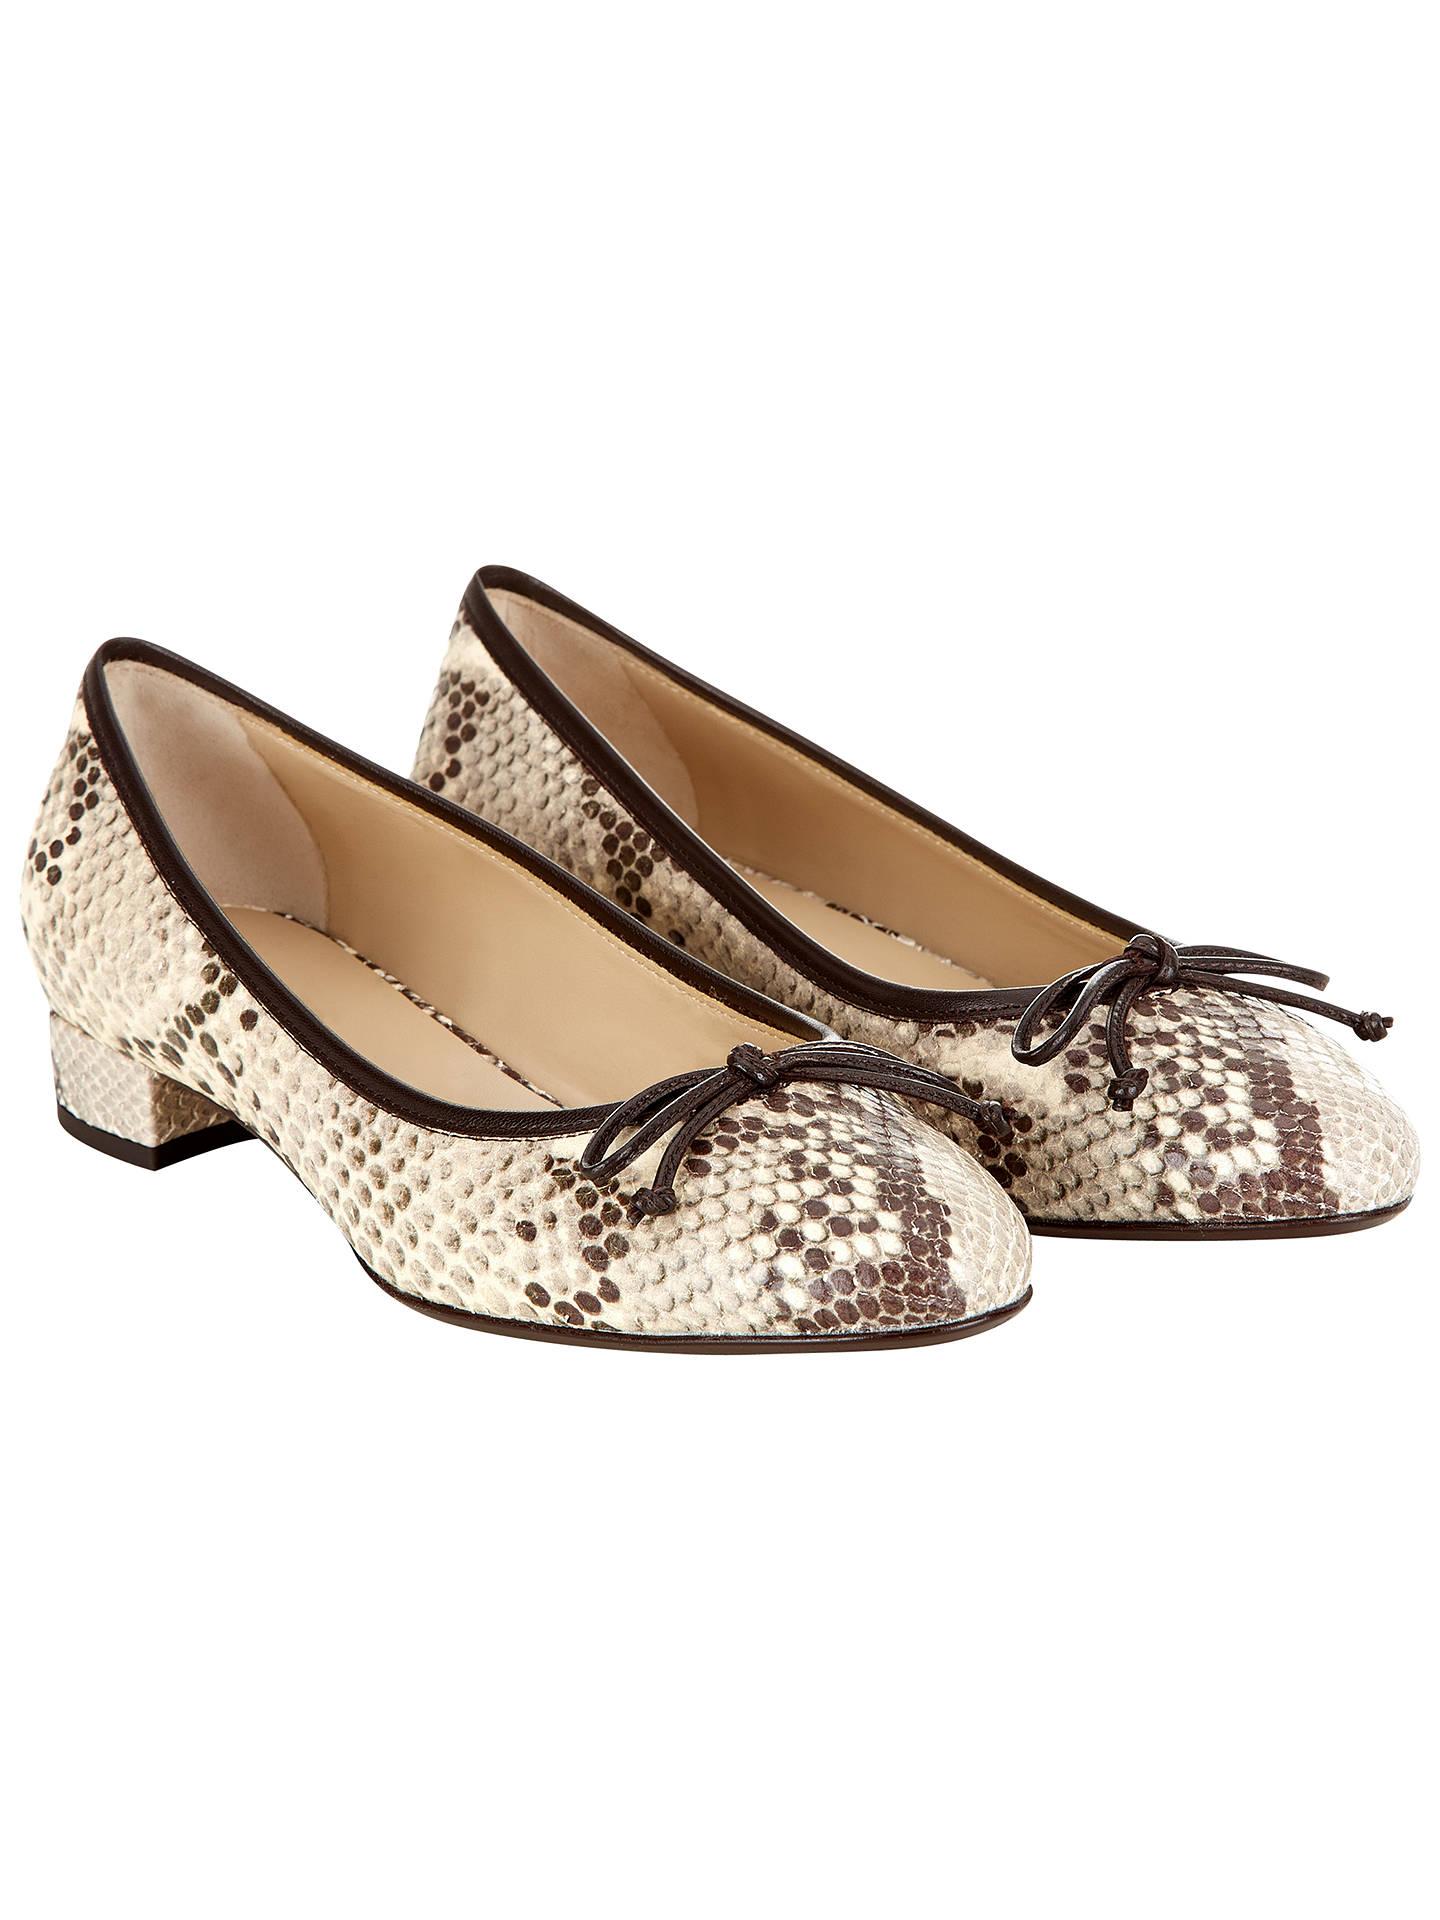 21c0b3d7879b0 ... Buy Hobbs Poppy Leather Block Heel Ballerina Pumps, Snake Print, 2  Online at johnlewis ...